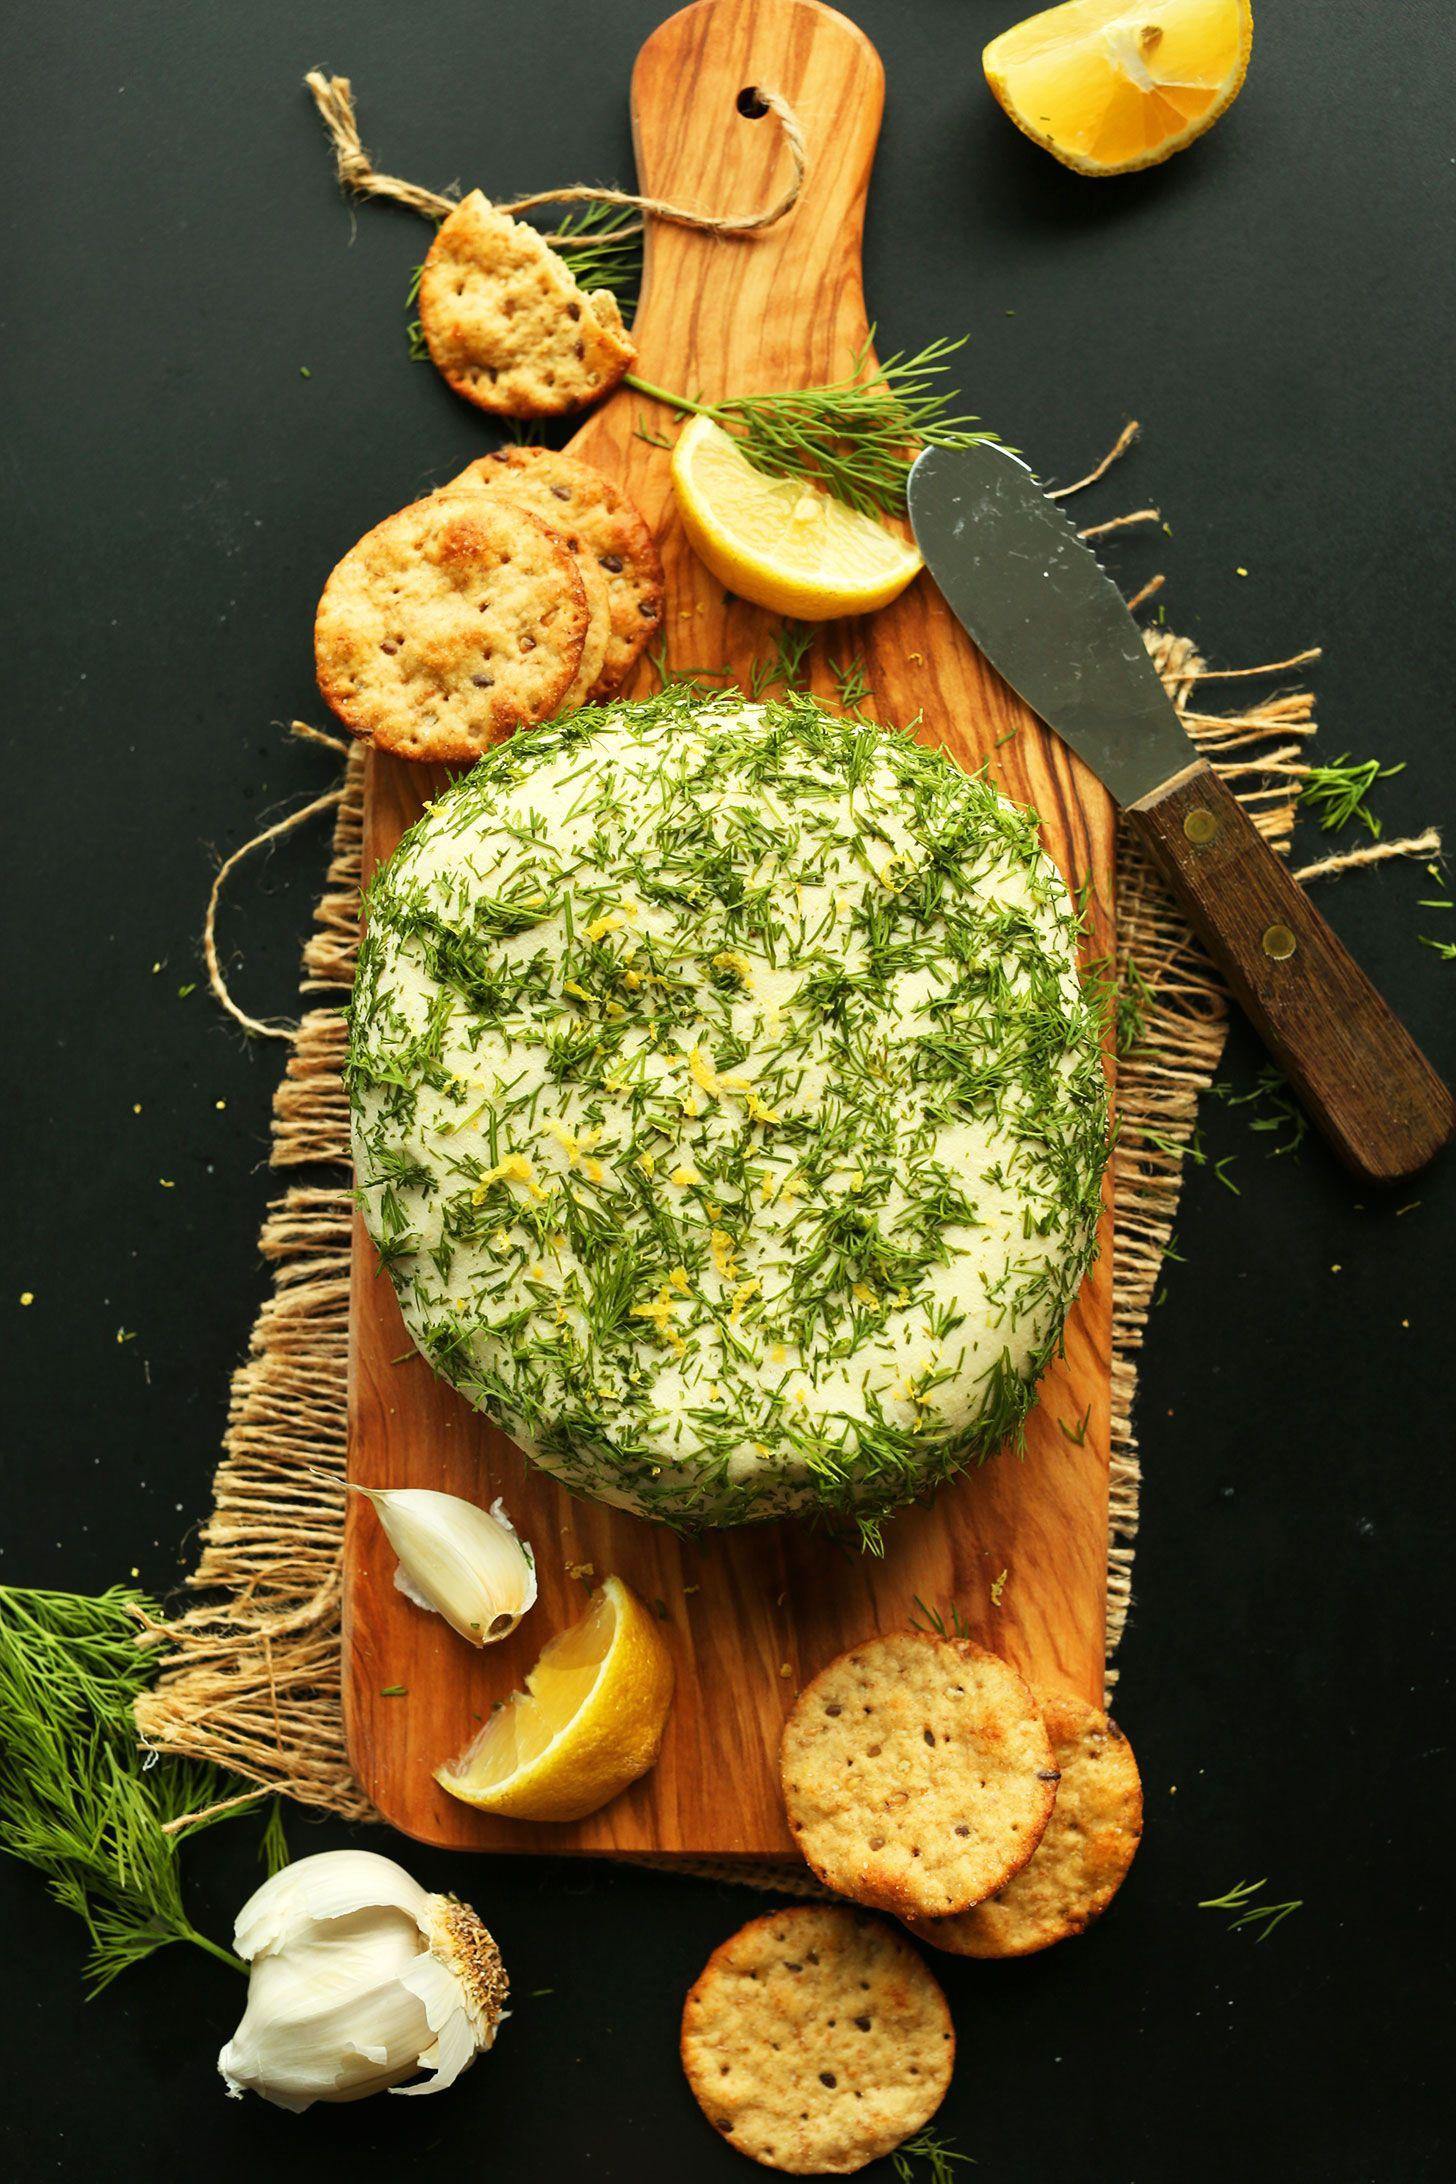 Easy Garlic Herb Vegan Cheese